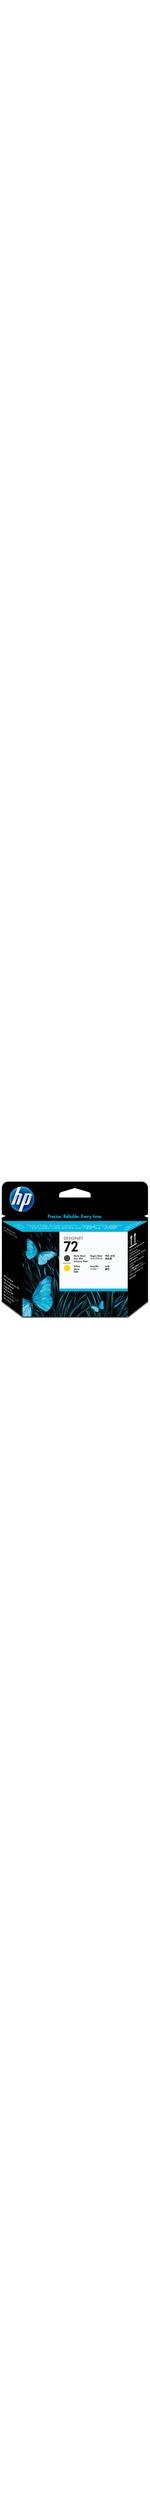 HP 72 Original Printhead - Matte Black, Yellow - Inkjet - 1 Each